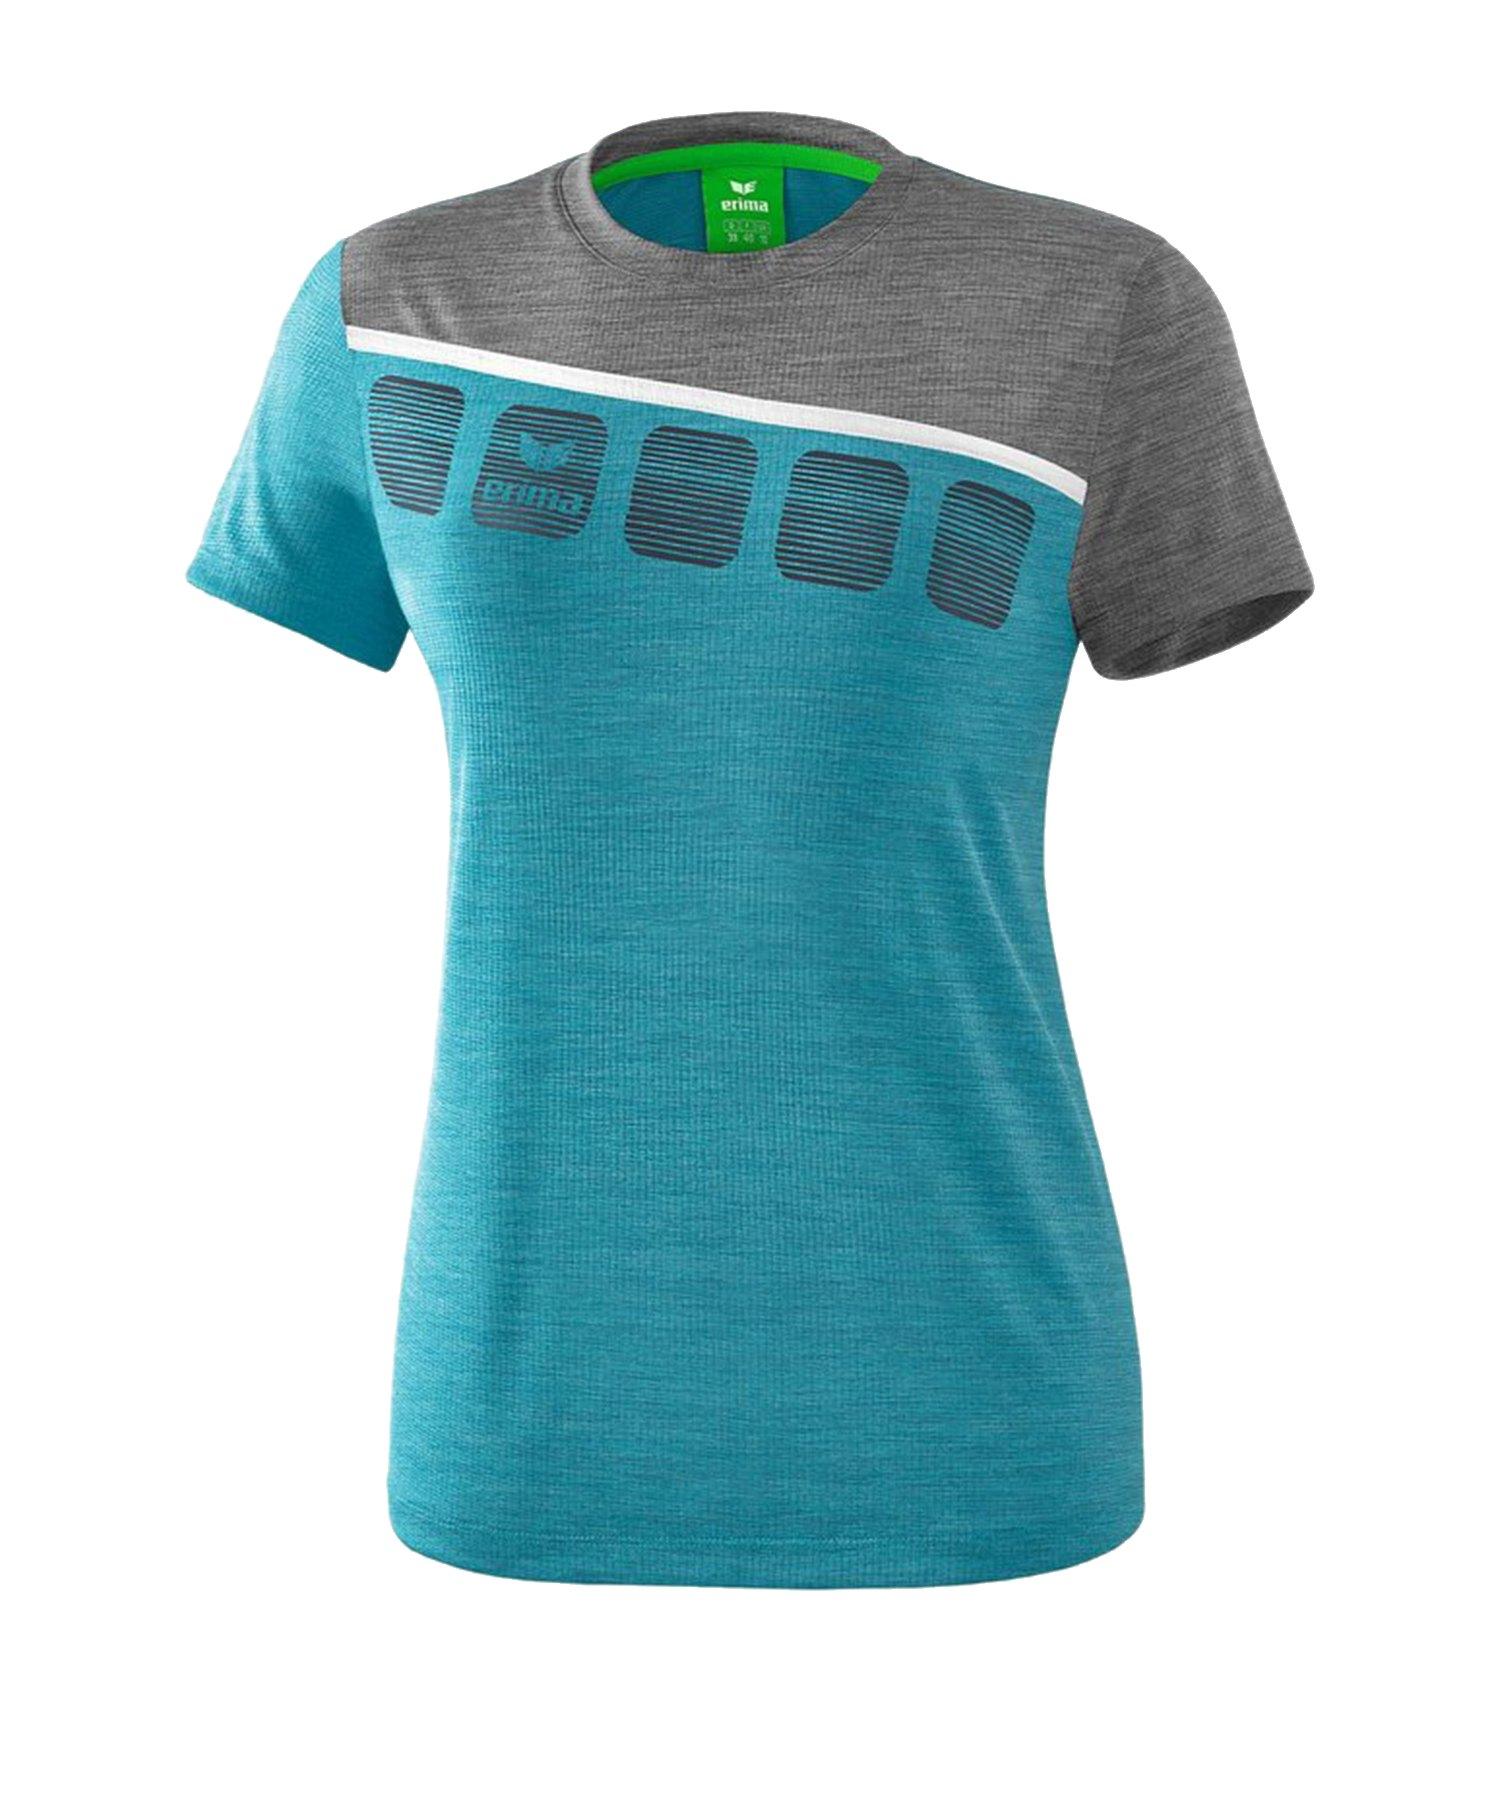 Erima 5-C T-Shirt Damen Blau Grau - Blau